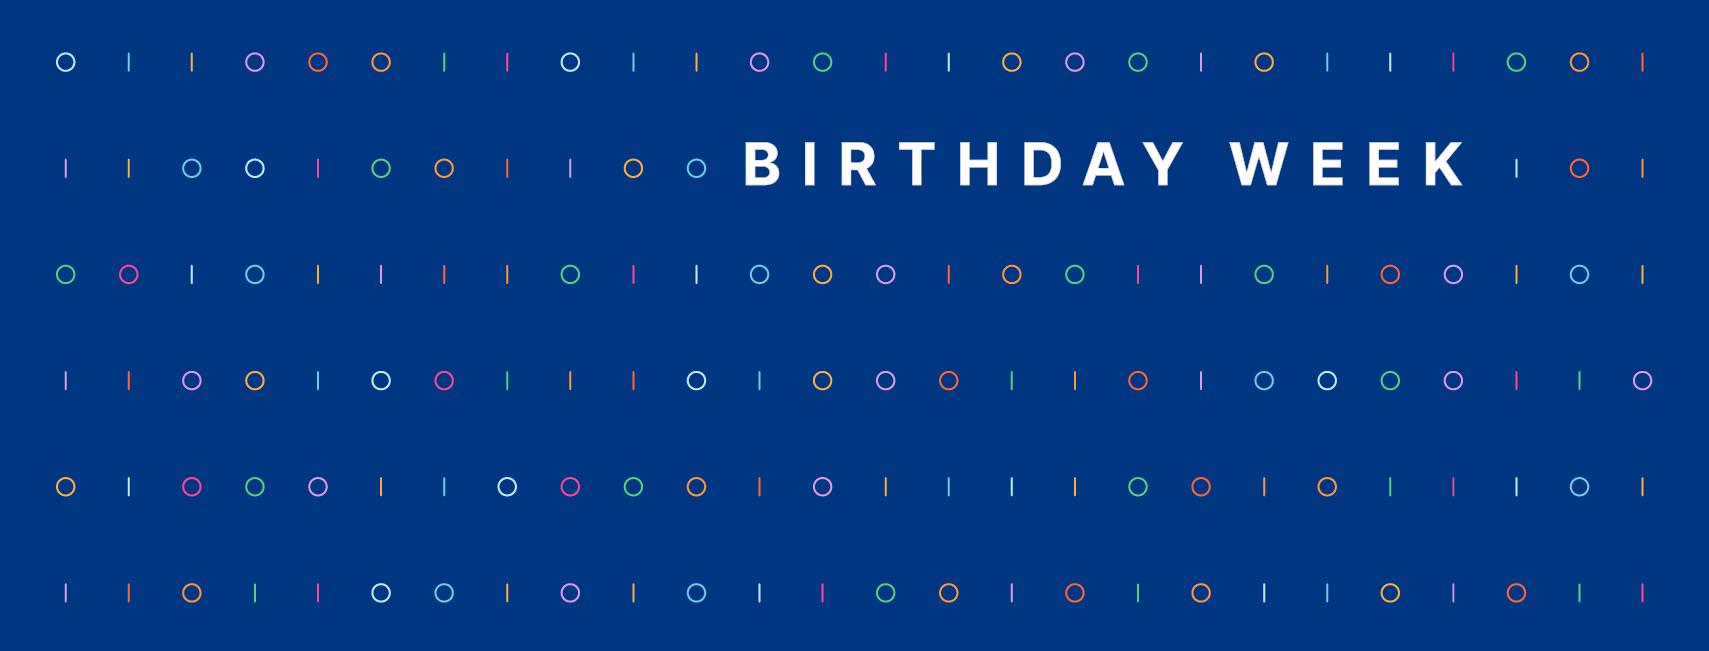 Birthday week: Cloudflare turns 10